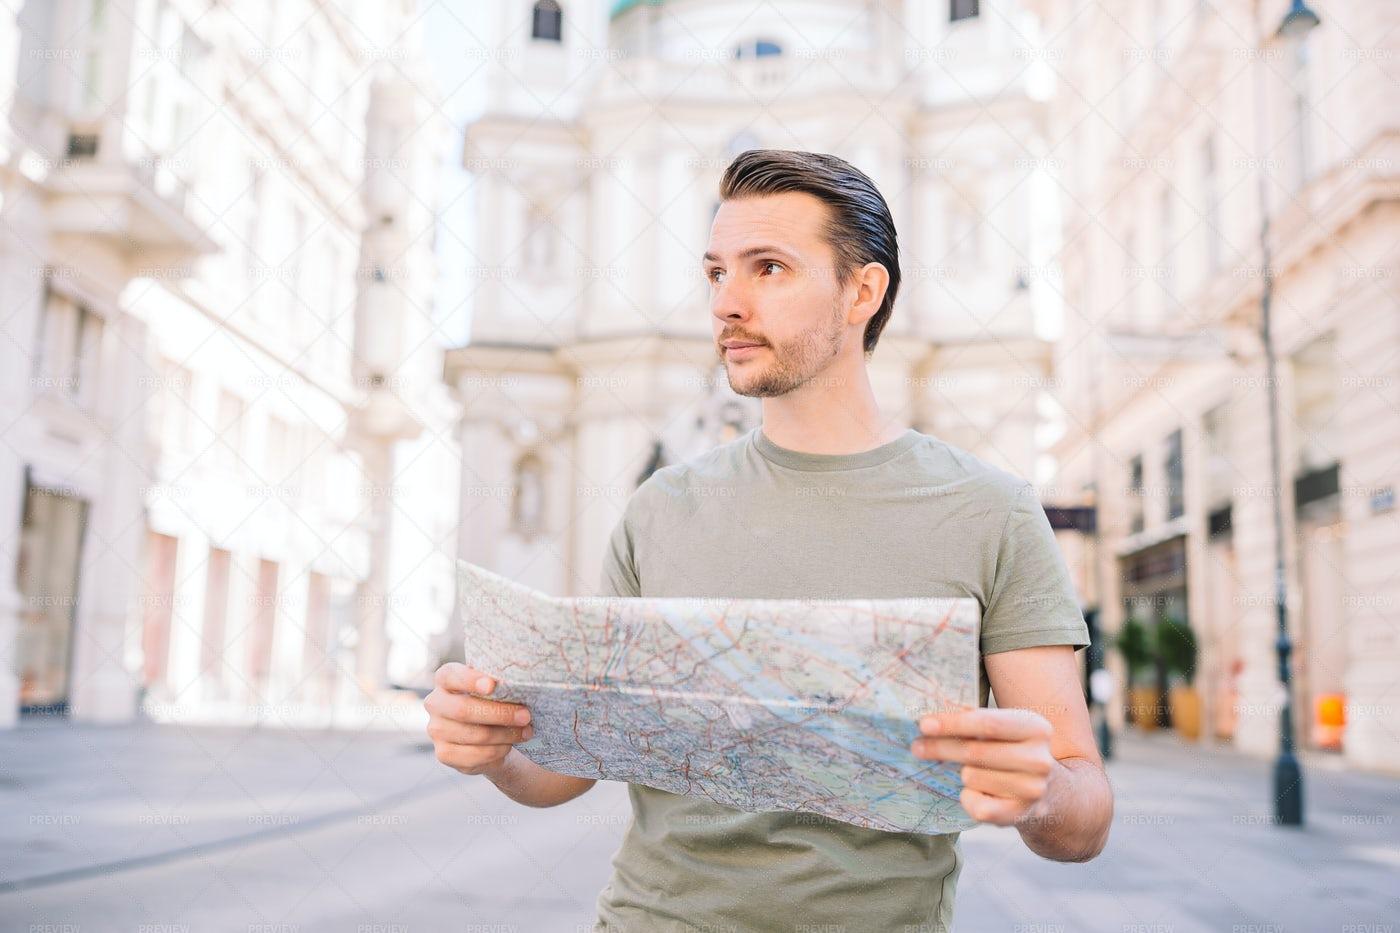 Exploring With A Map: Stock Photos